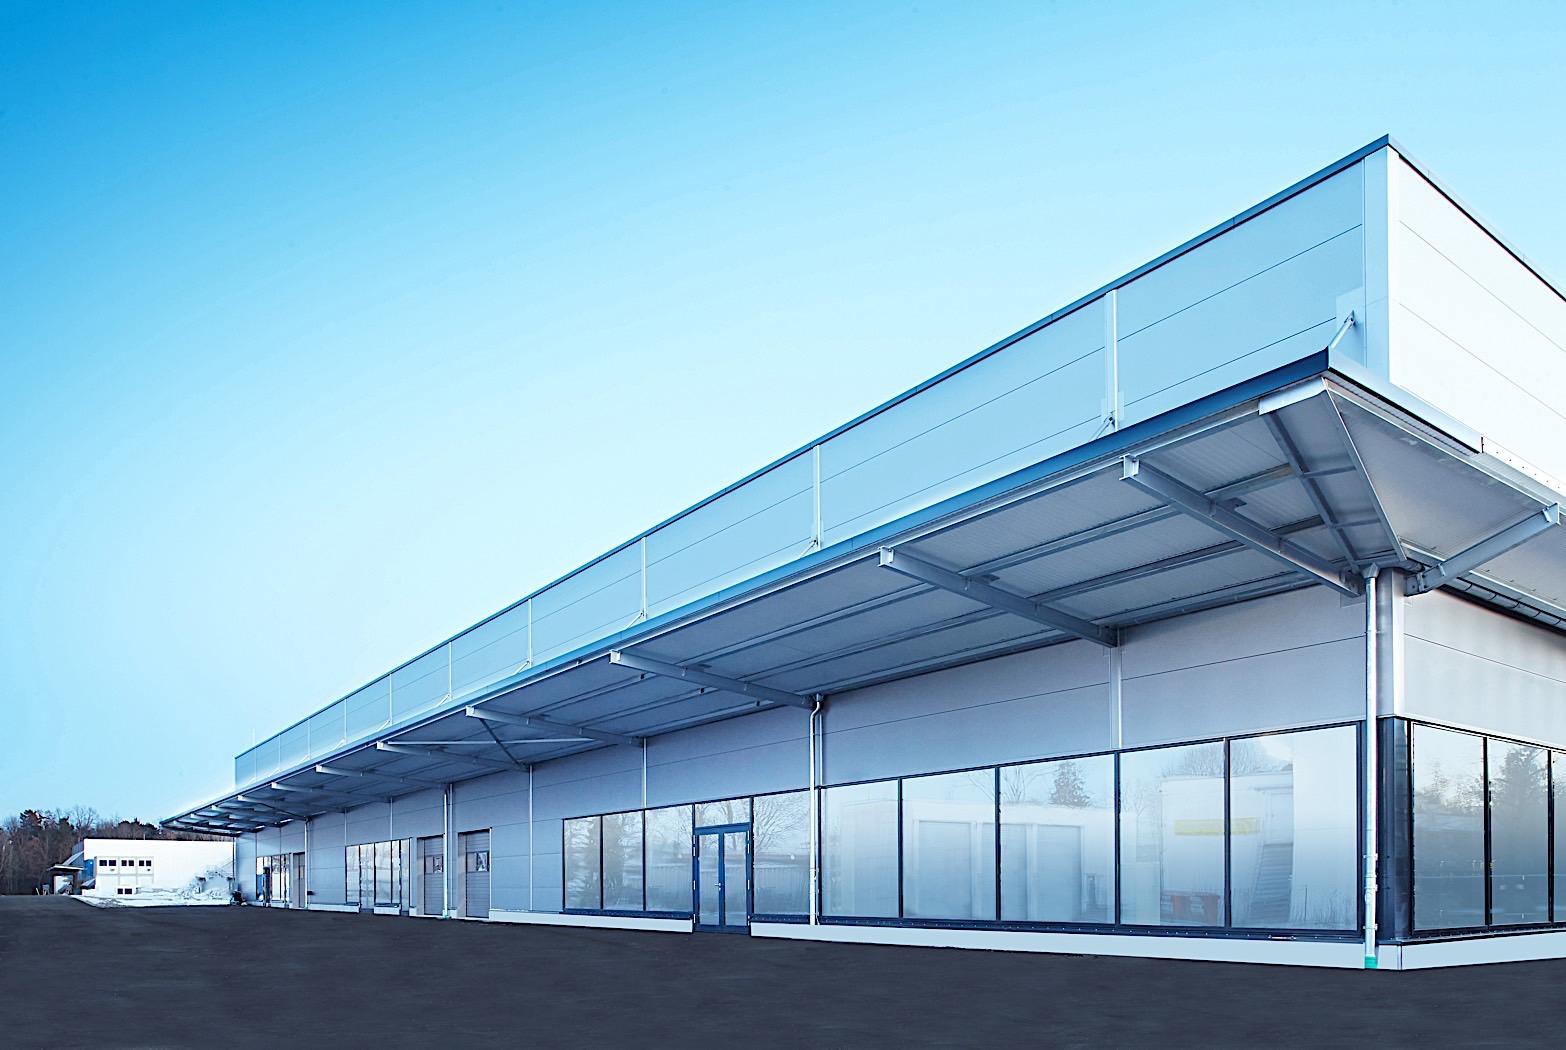 BMWが2019年にアディティブ・マニュファクチャリング・キャンパスを開設